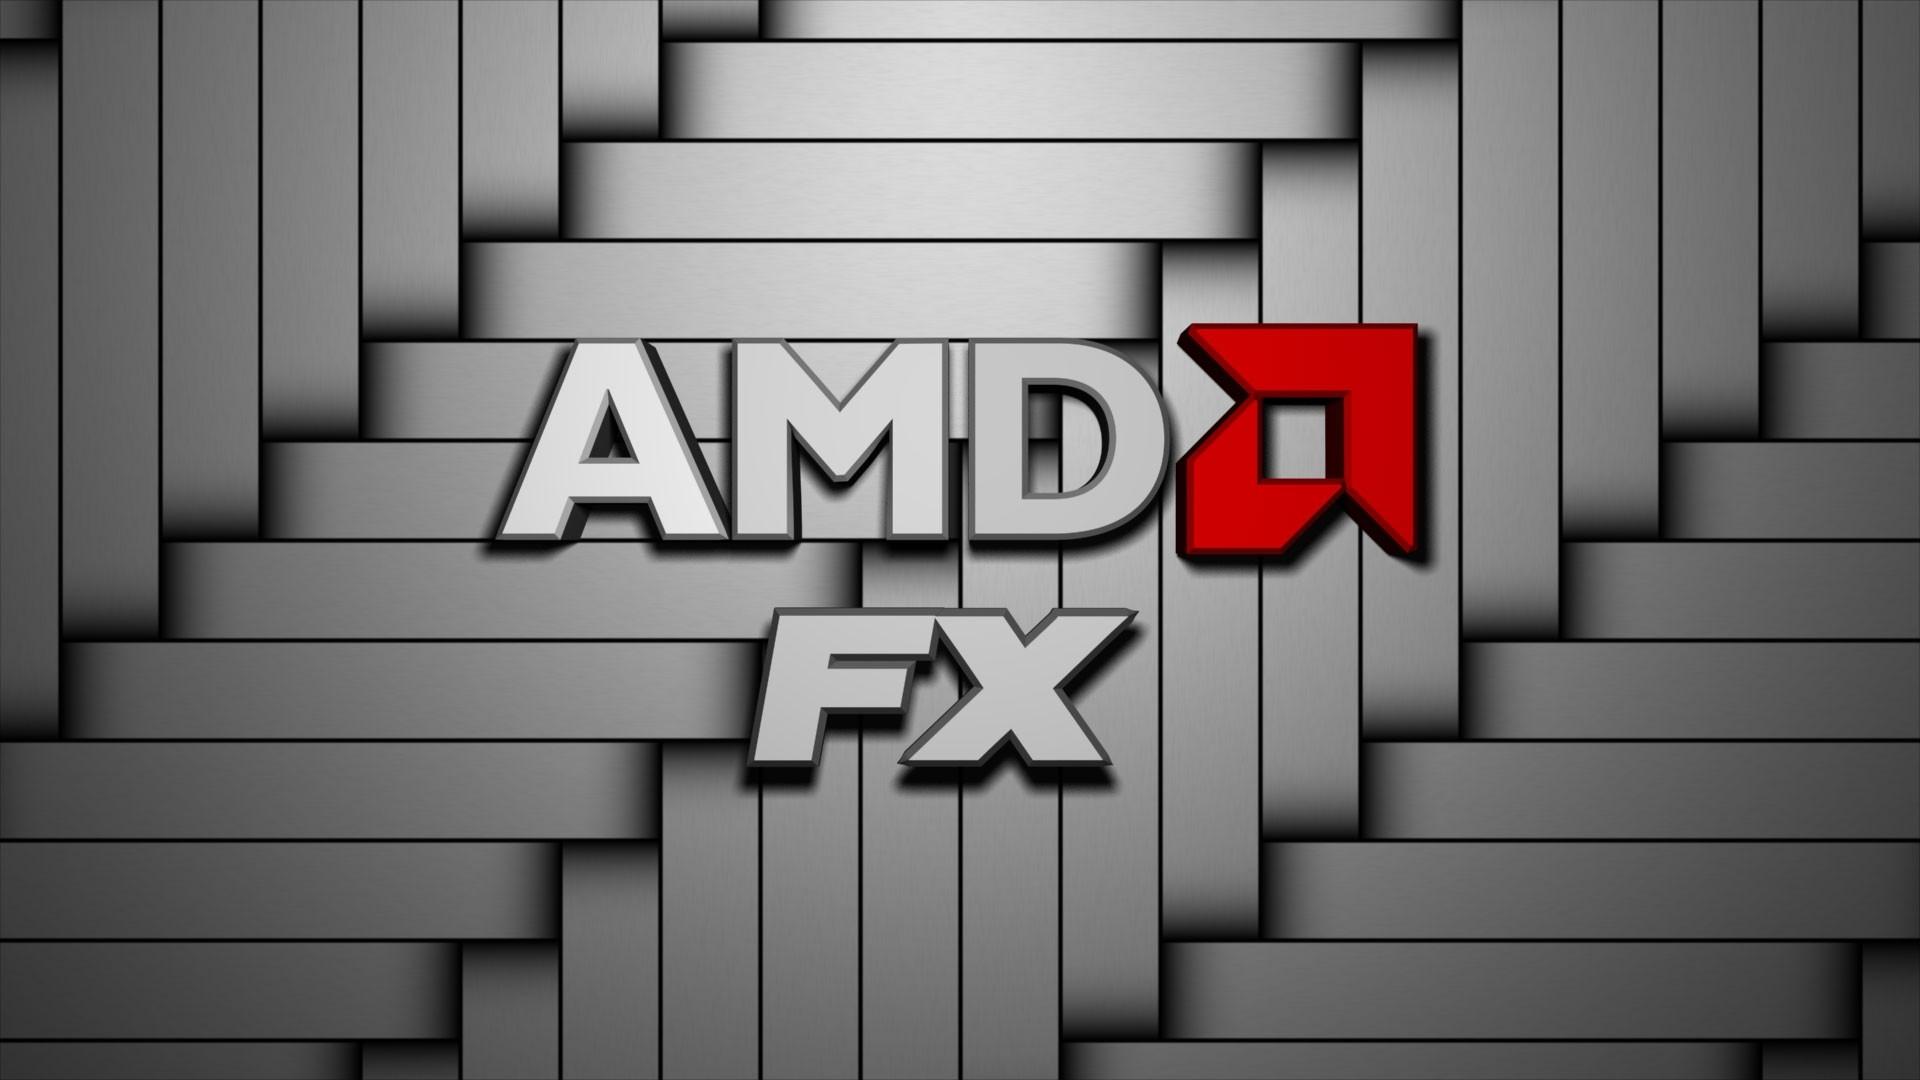 Res: 1920x1080, Amd Fx HD Background.